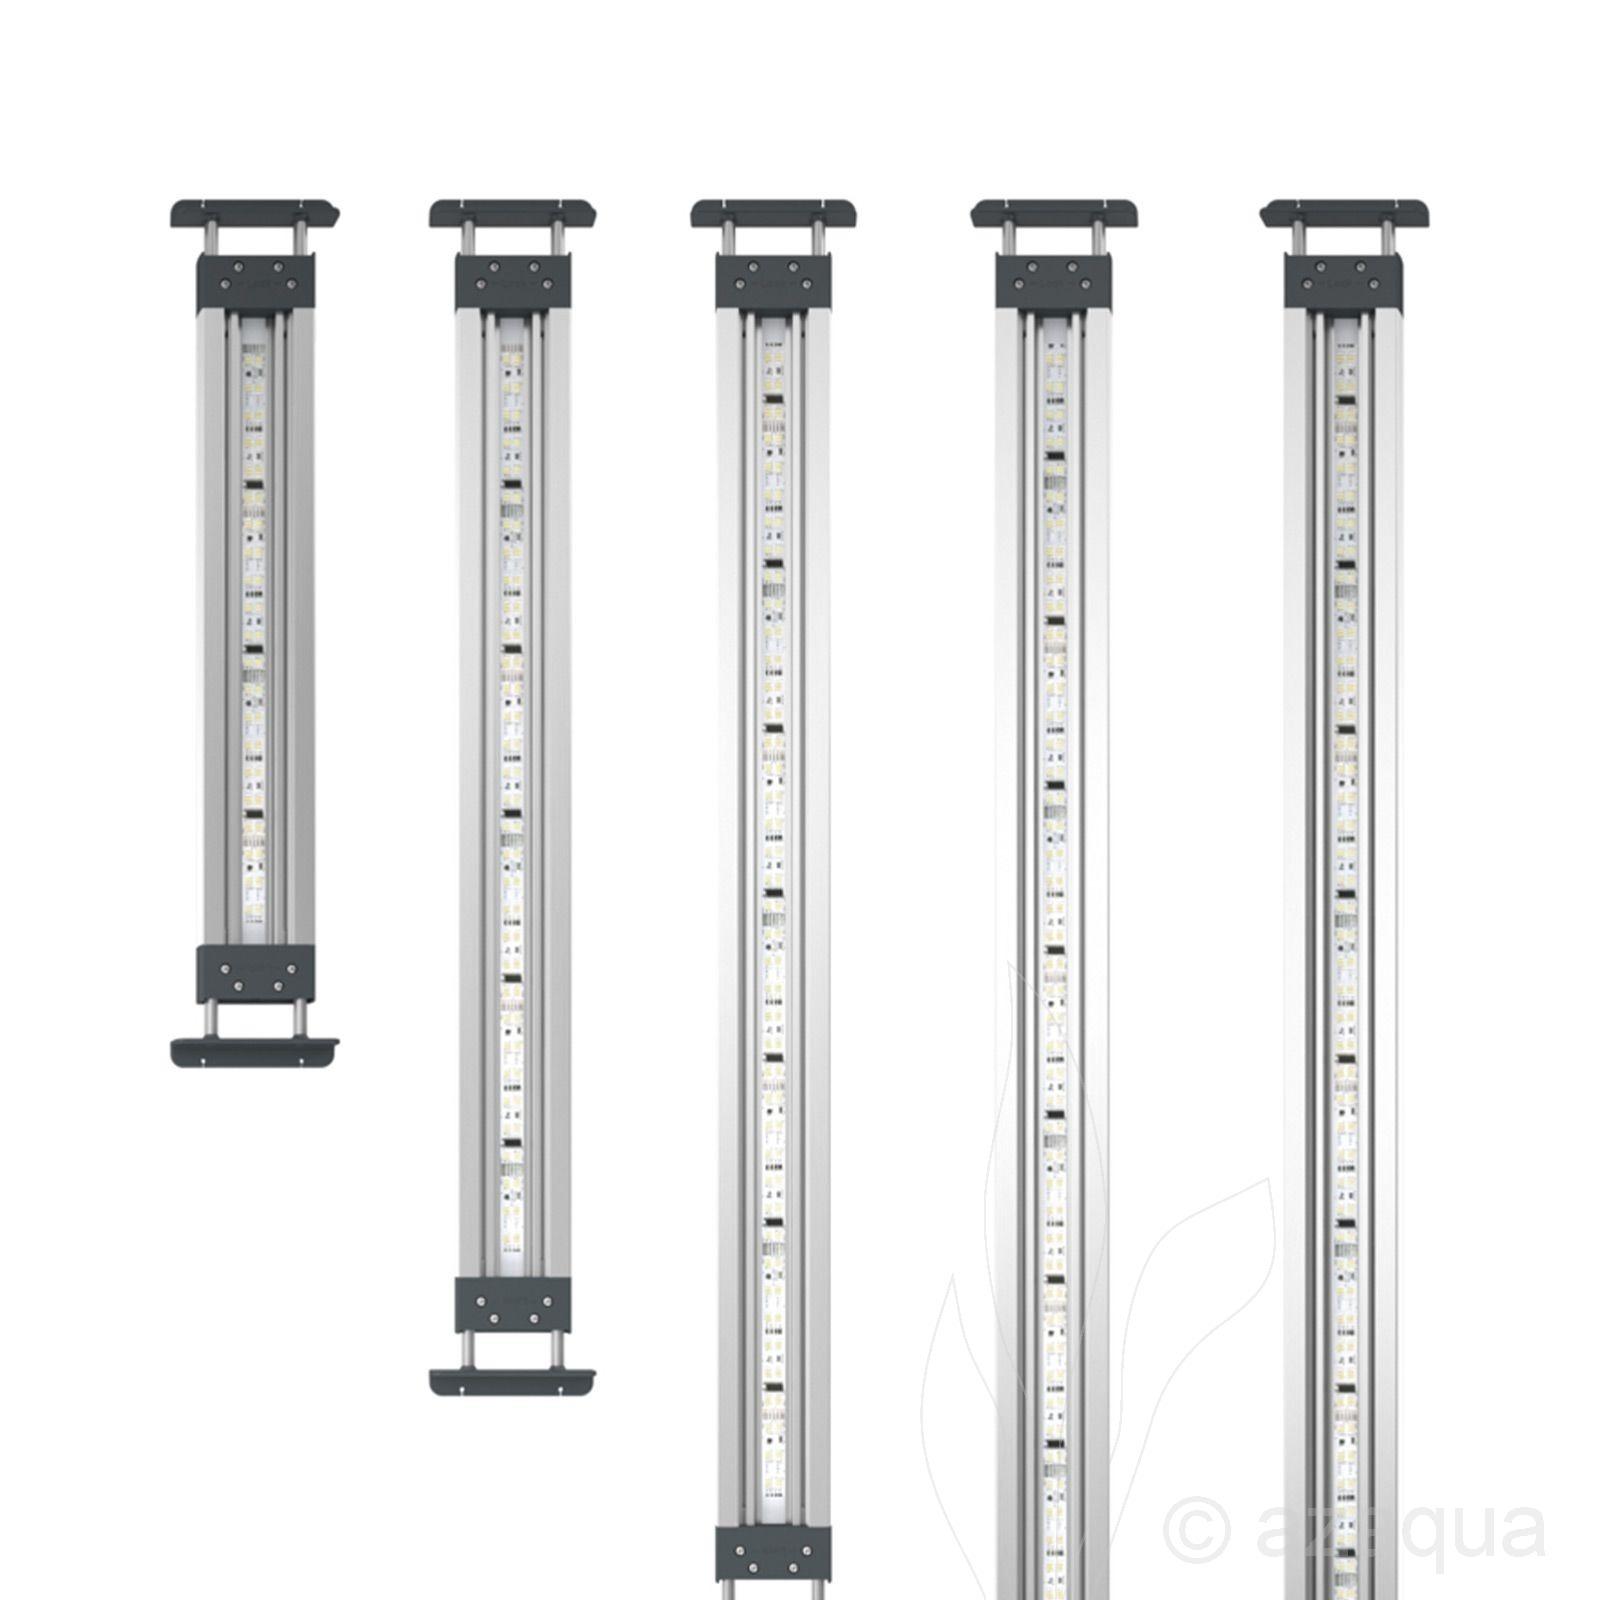 Oase HighLine Premium LED